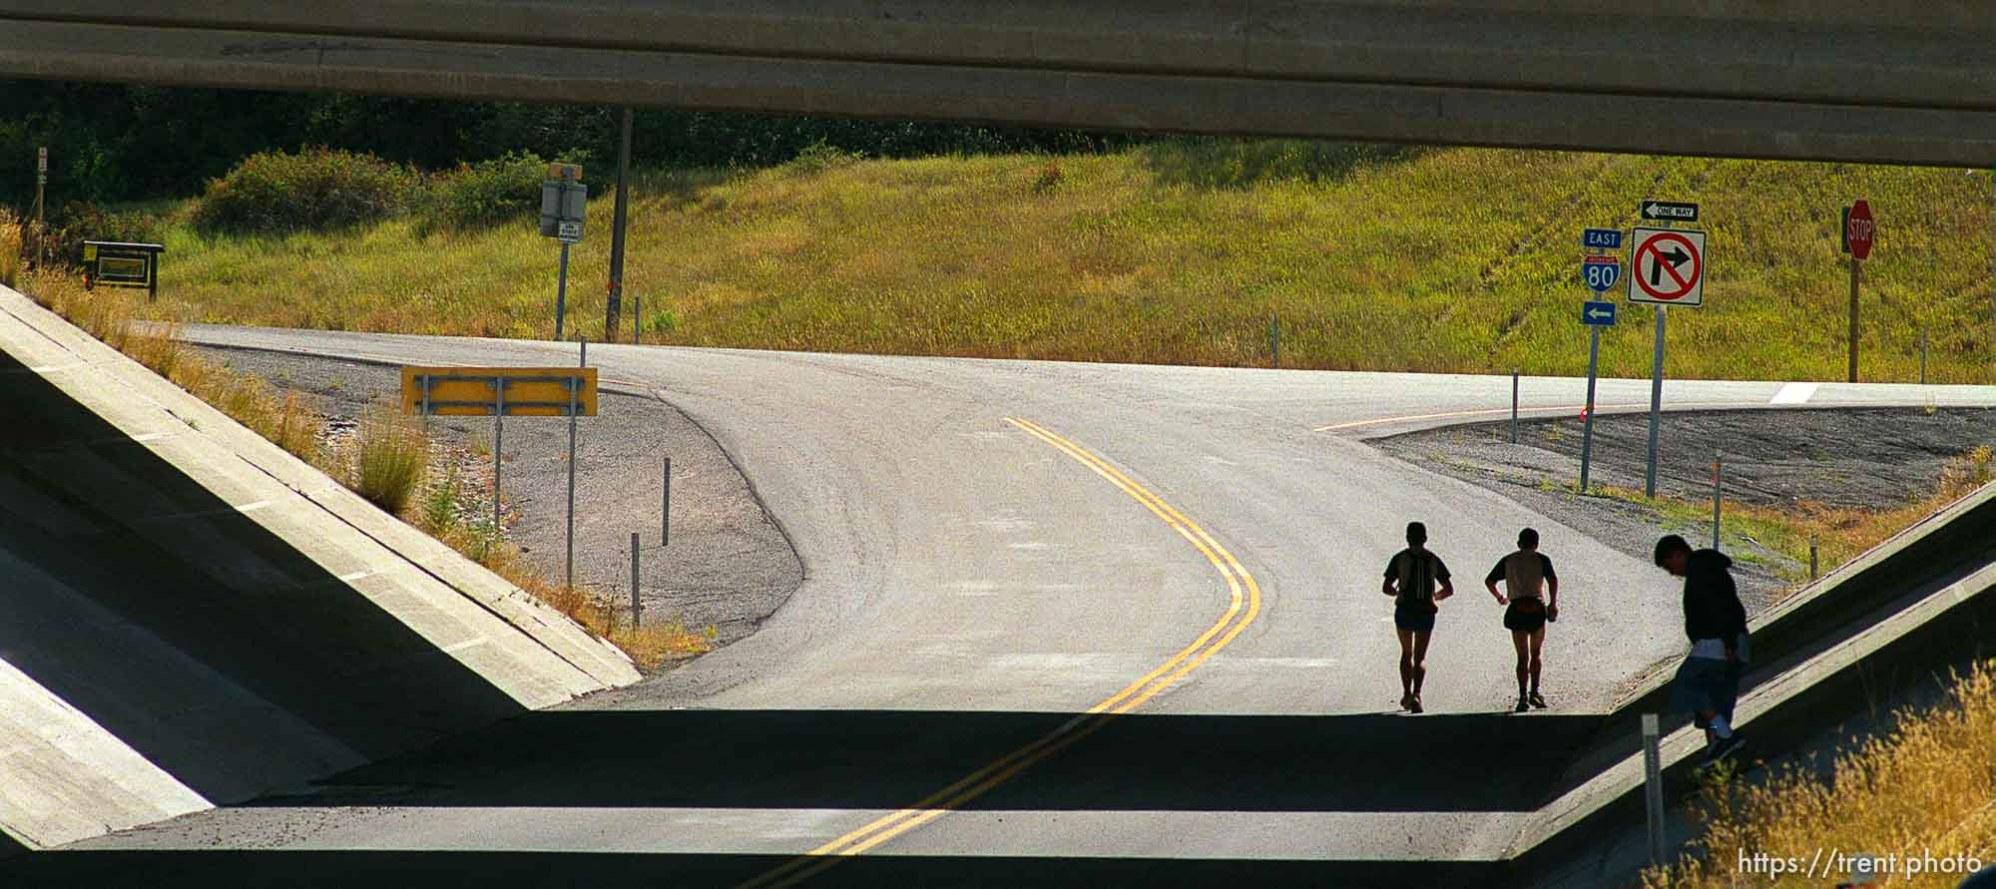 Mark Hartell and Mark McDermott run under I-80 near the Lambs Canyon aid station. Wasatch 100 Endurance Run.